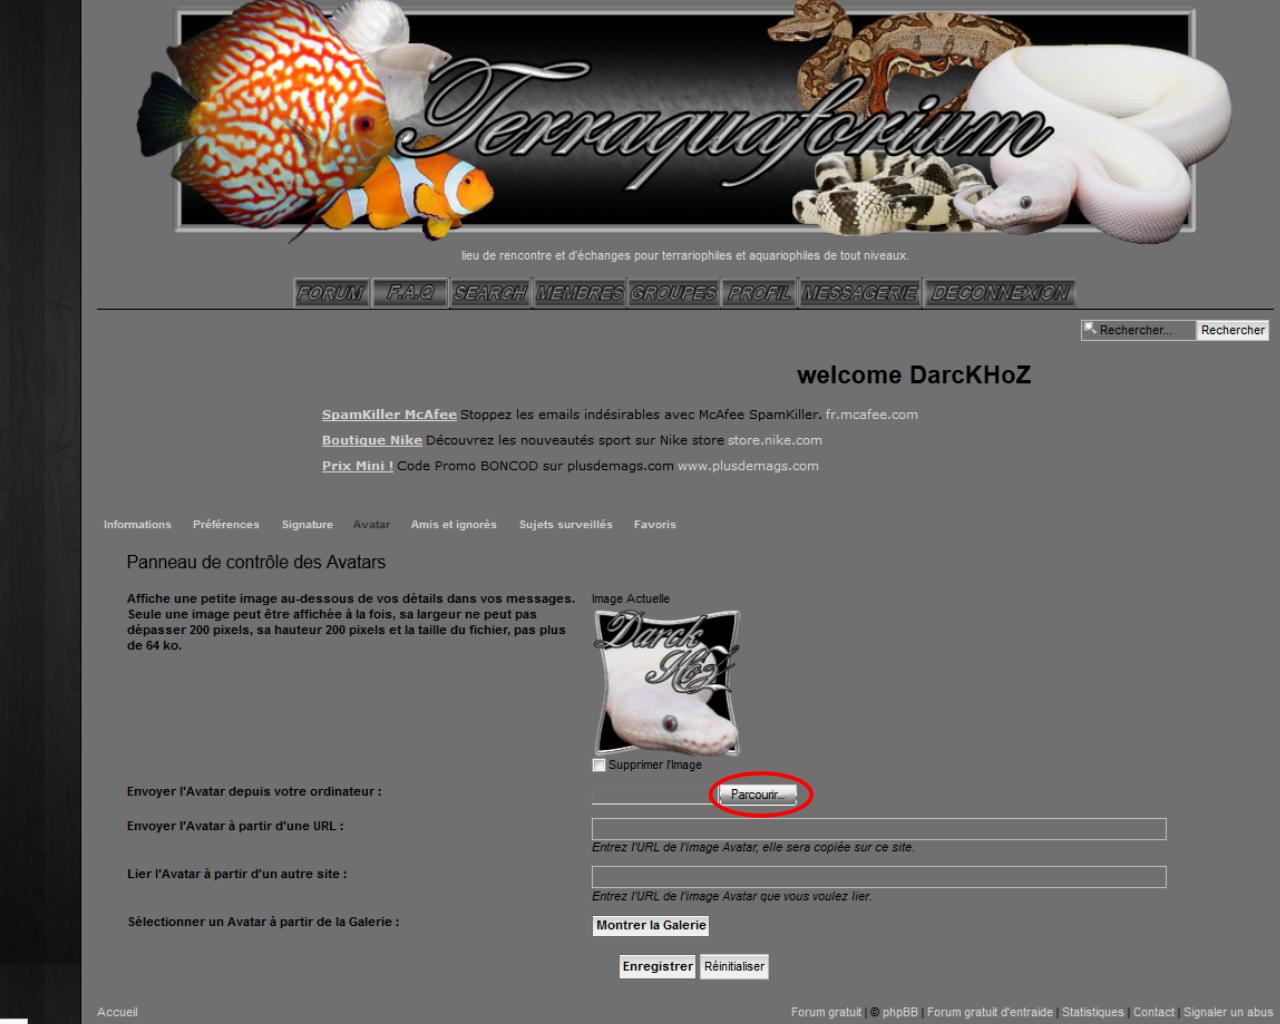 tuto changer son avatar (image de profil) Tutoimageprofilp3